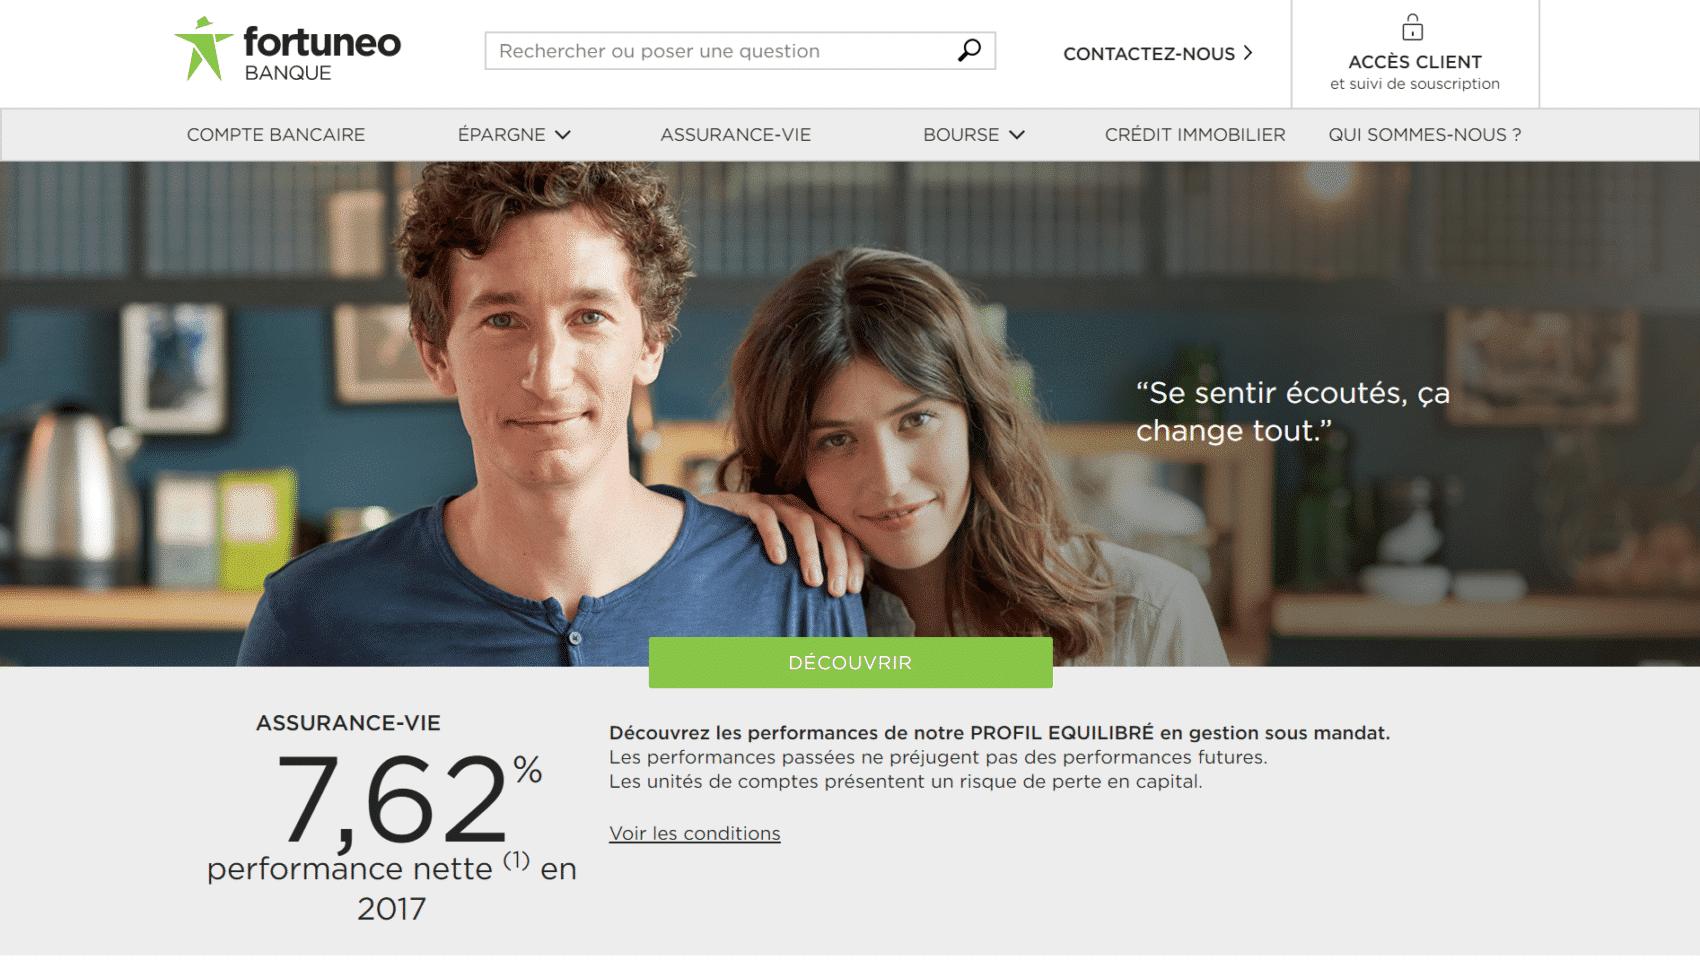 Fortuneo - banque en ligne